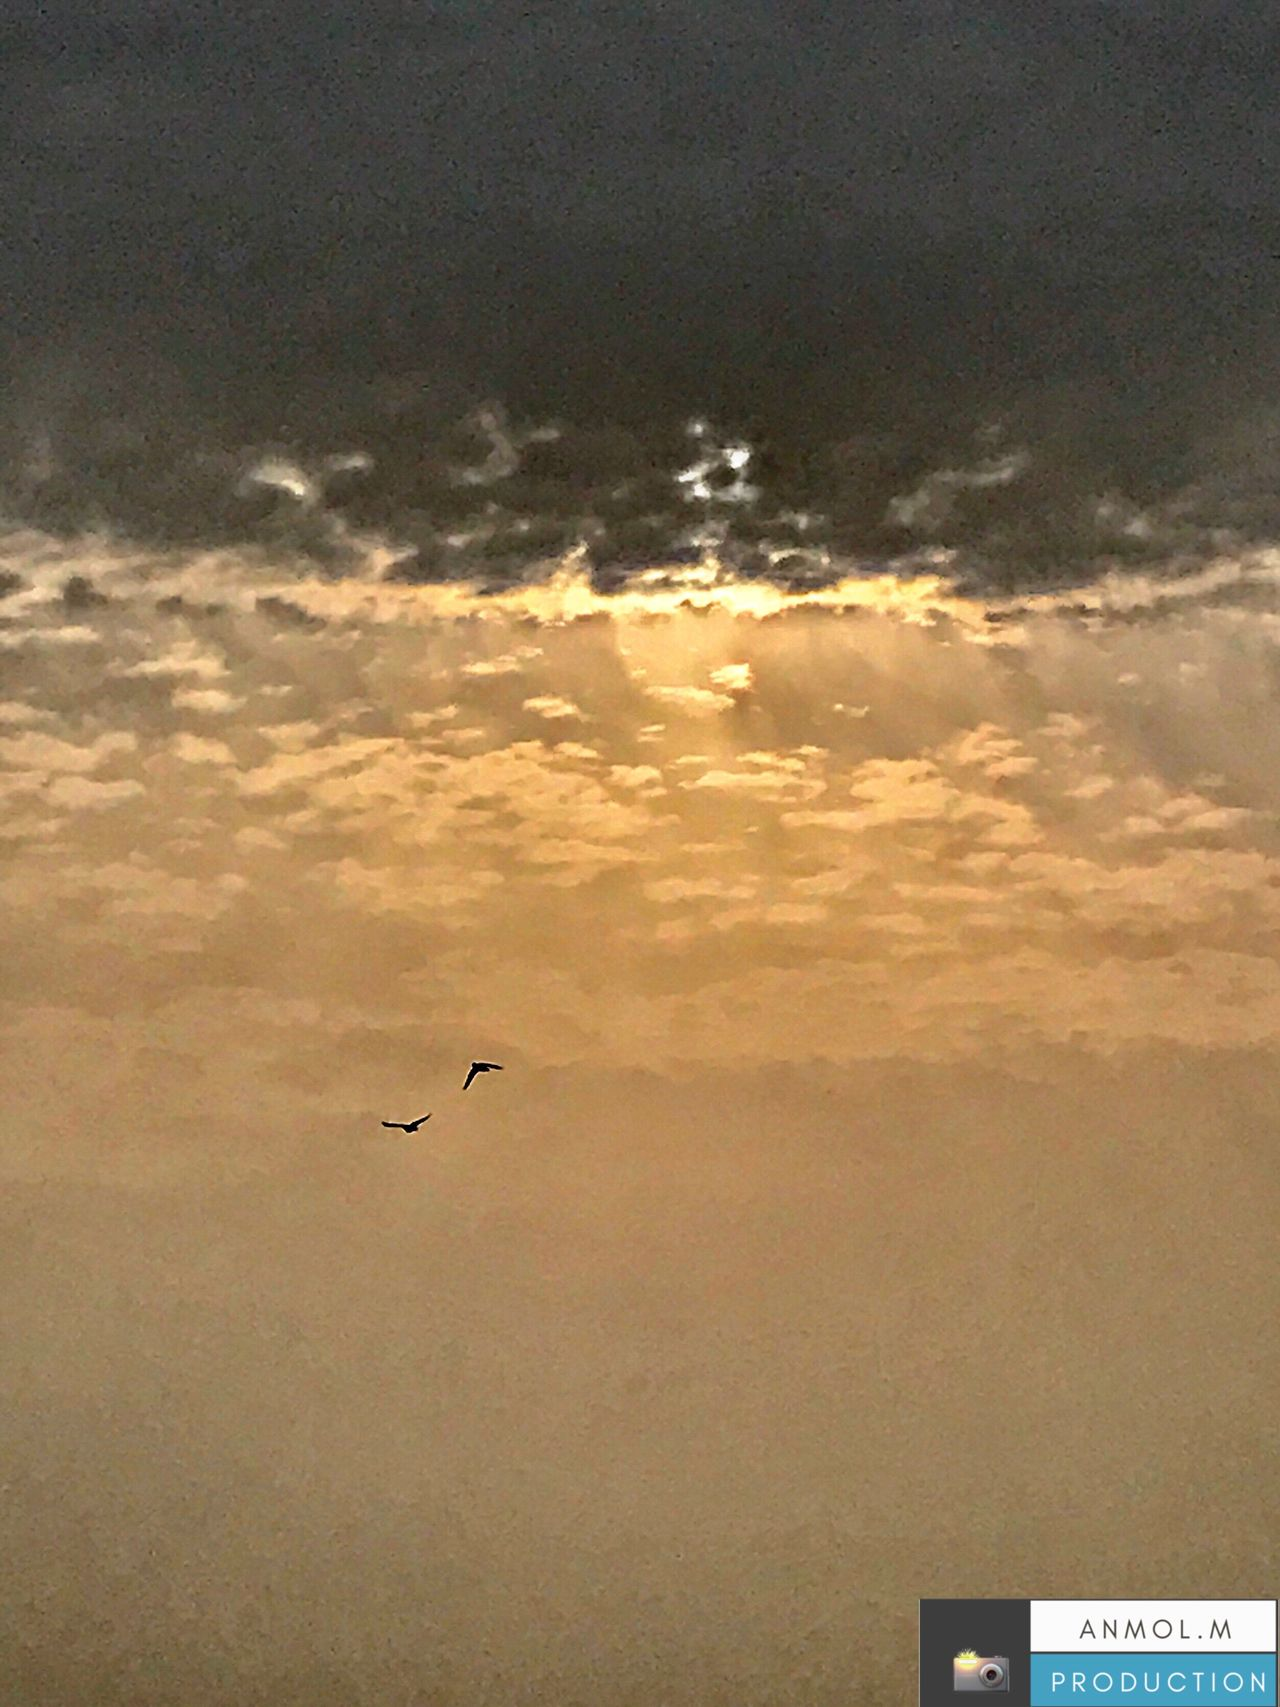 Outdoors #sky #landscape #daylight #weather #bird #sunset #evening #dawn #dusk #storm #freedom #light #travel #traveling #visiting #instatravel #instago #desert #wind #beach #solitude